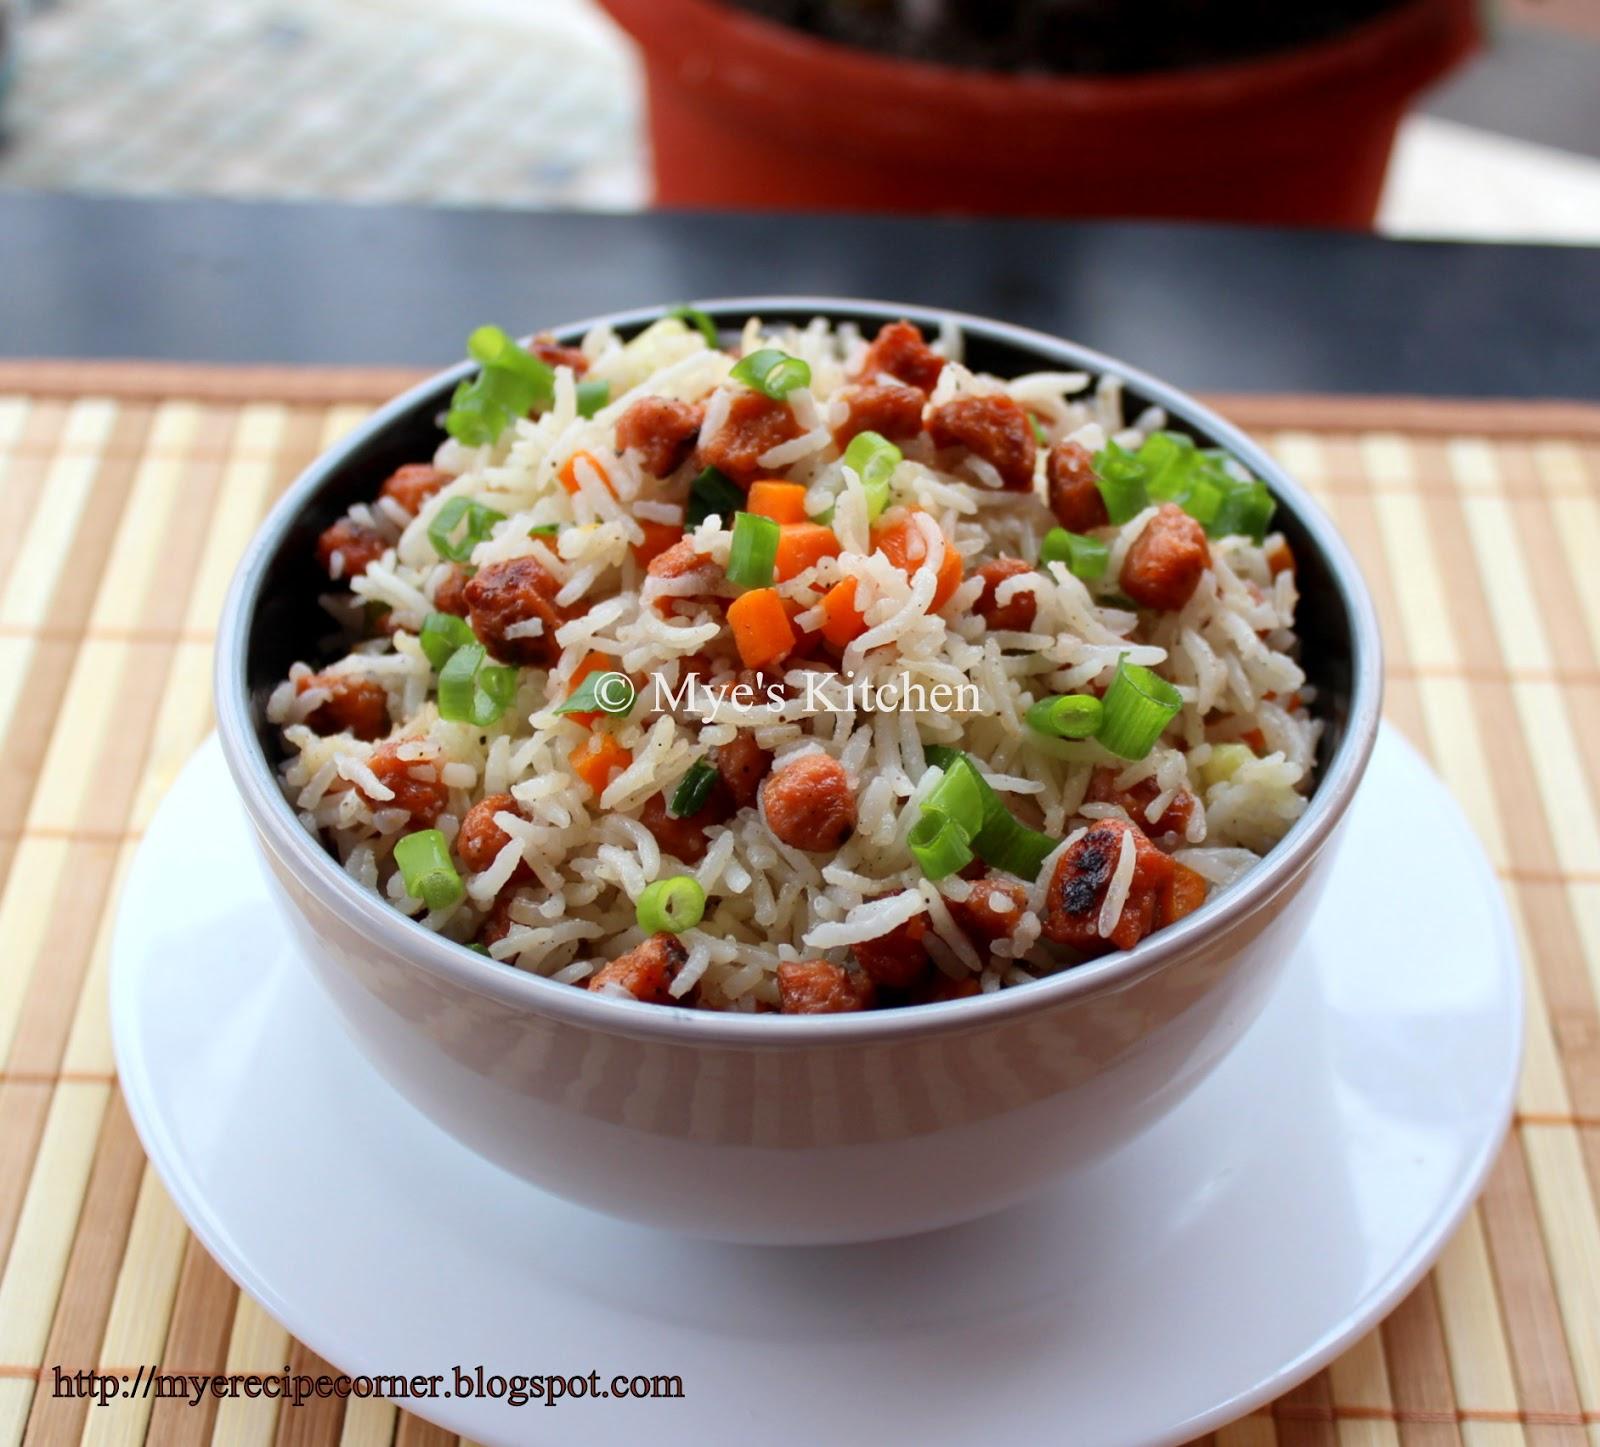 Myes kitchen soya chunks fried rice meal maker recipes soya chunks fried rice meal maker recipes forumfinder Choice Image